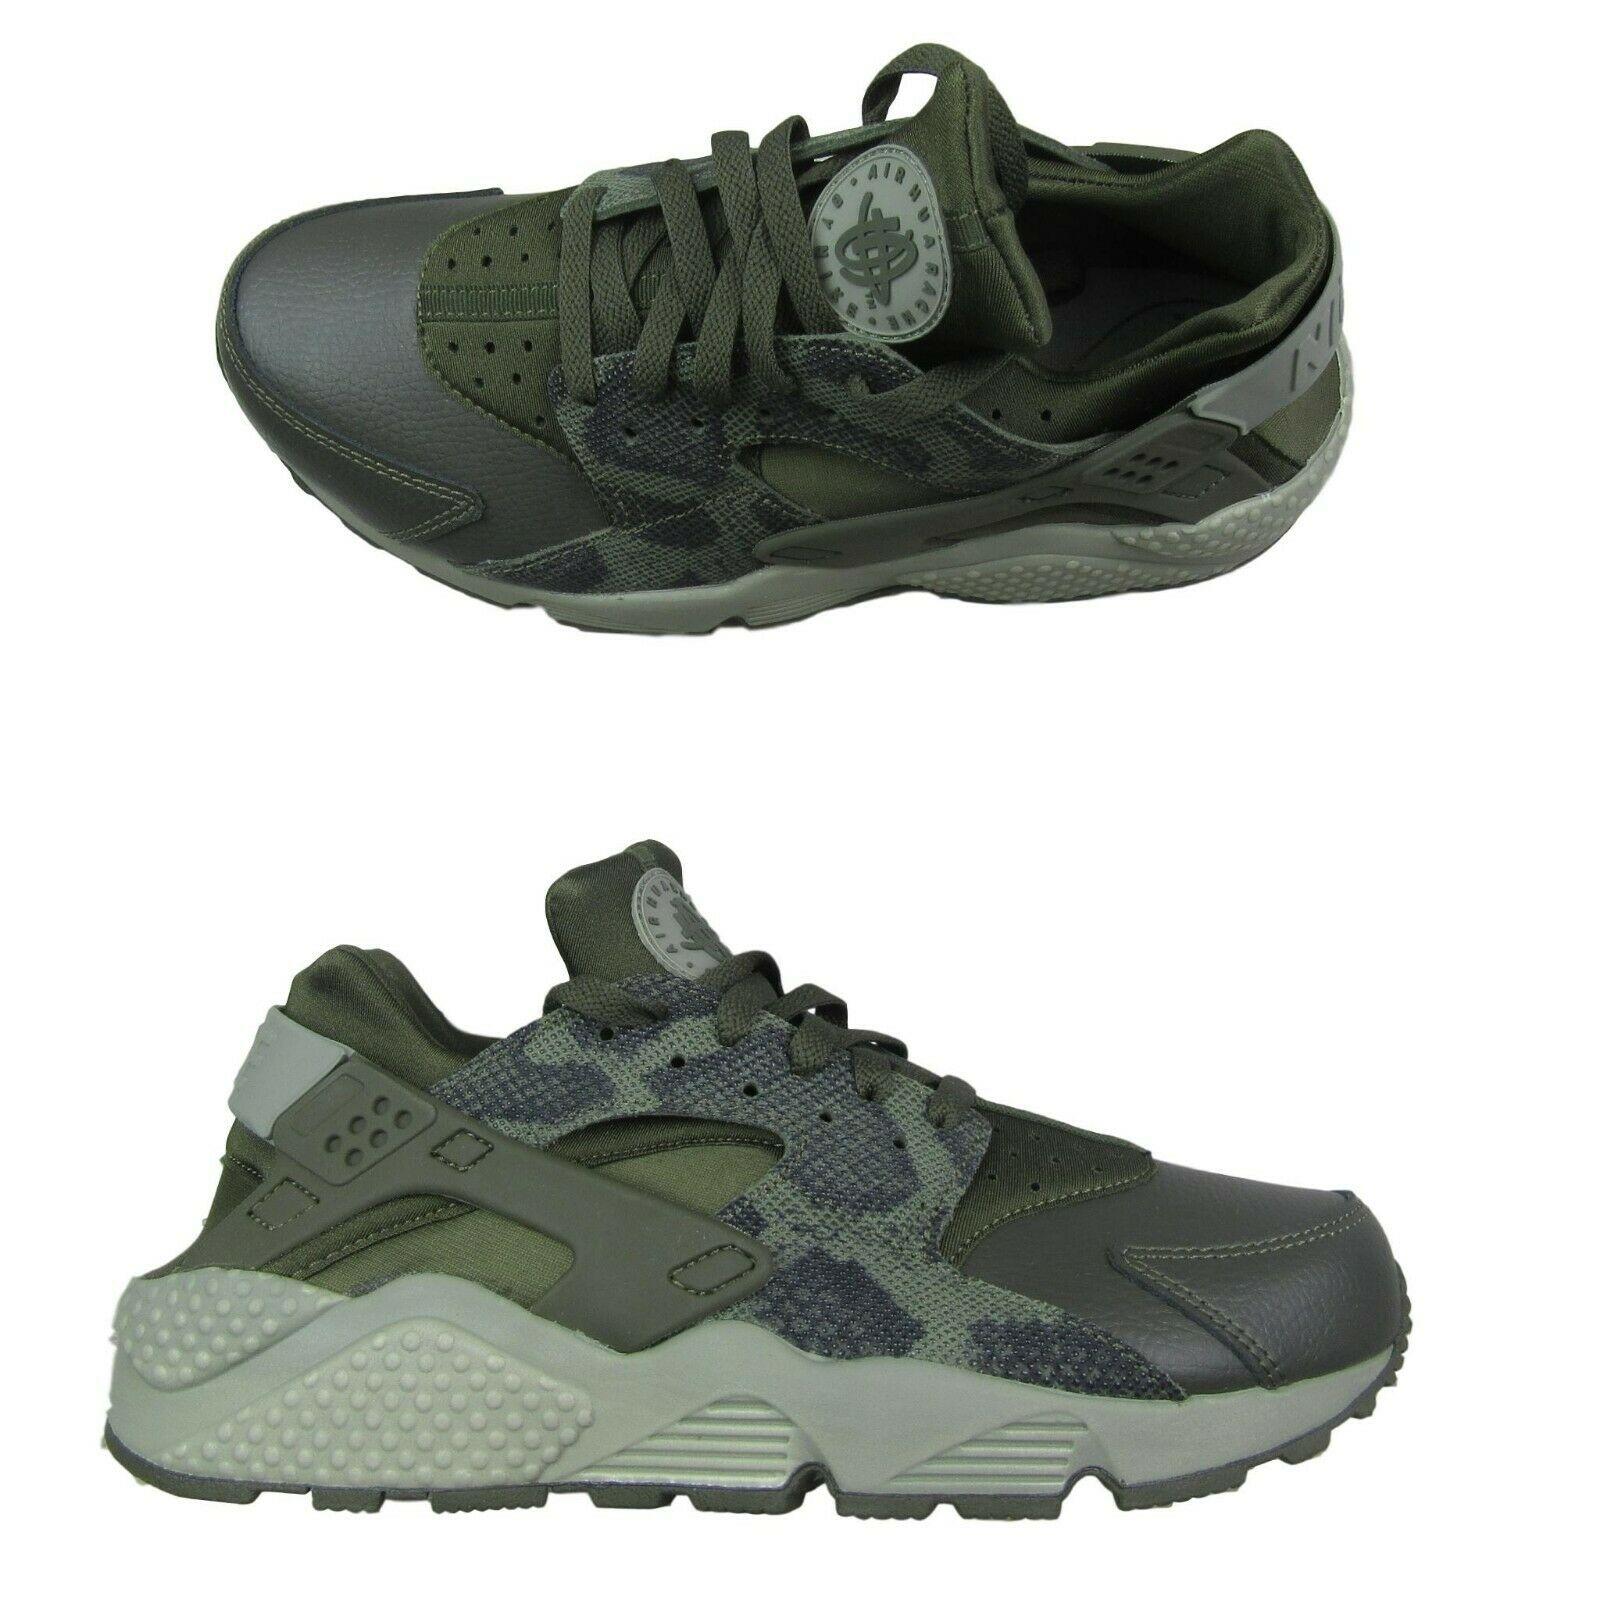 online store 431cb ee2c6 nike-air-huarache-run-premium-running-shoes-size-